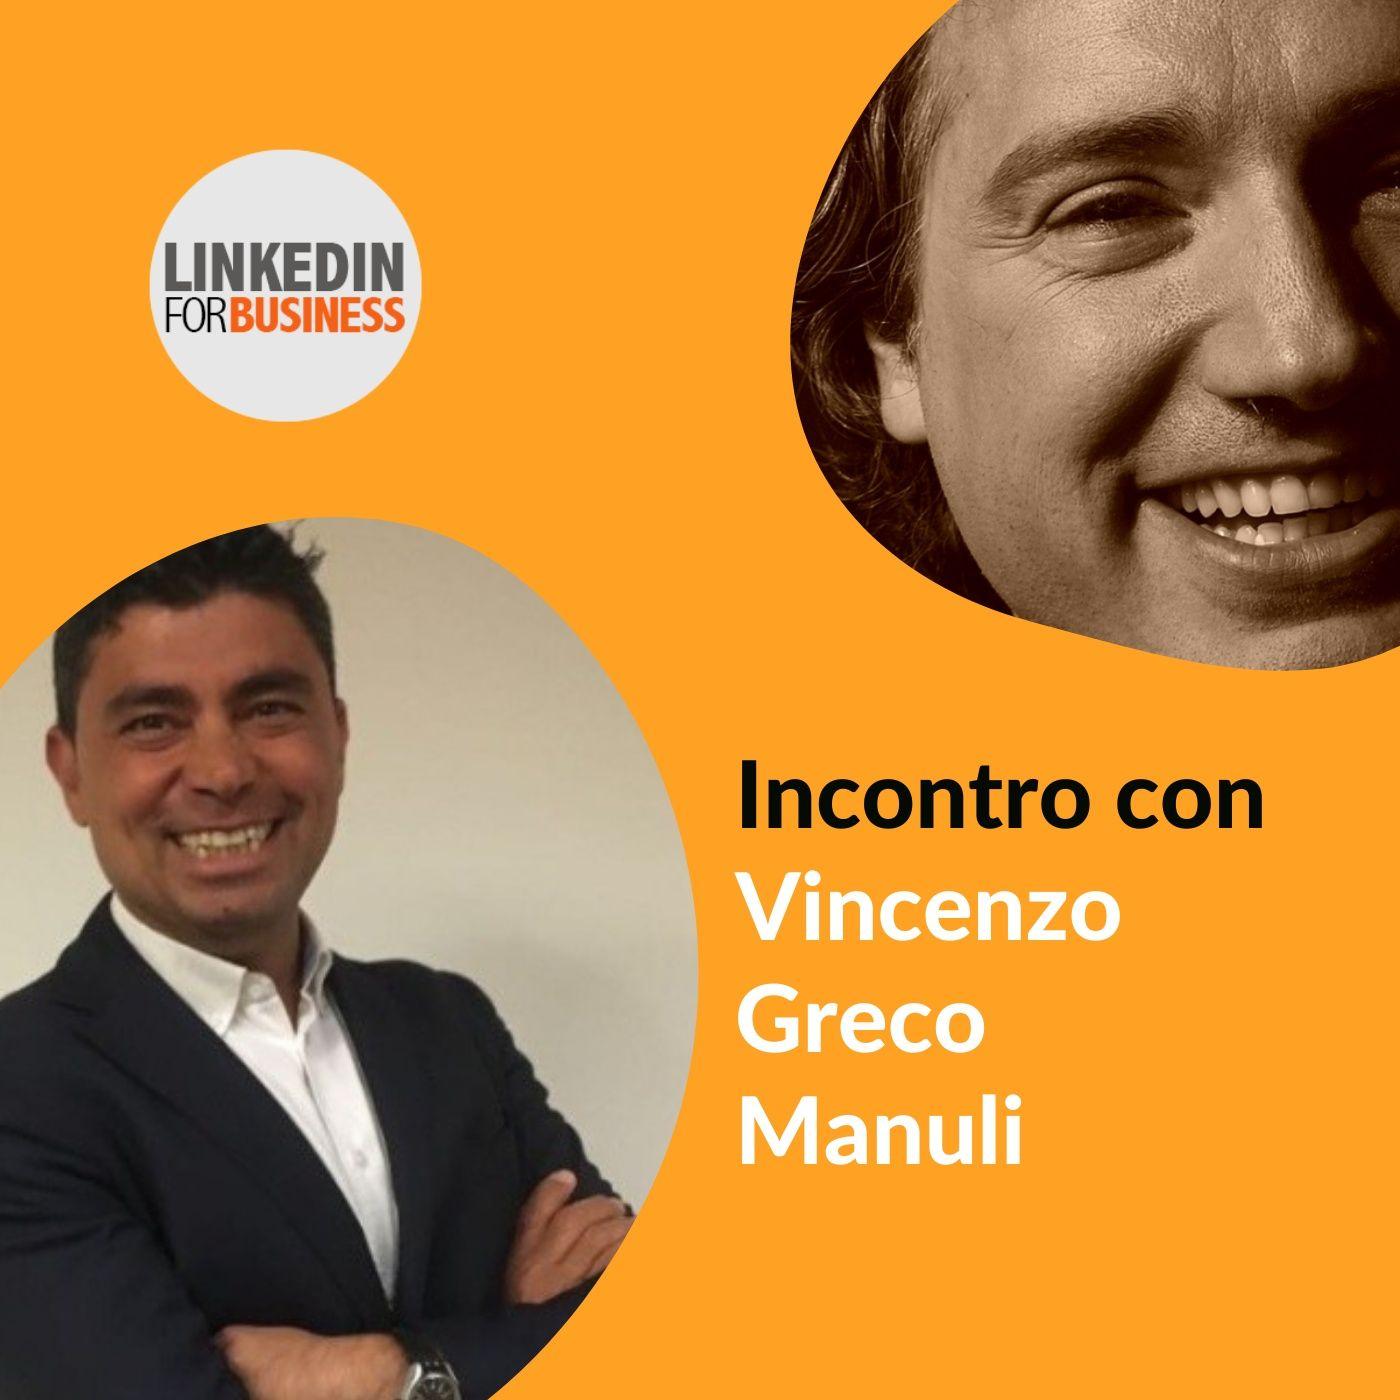 141 - LinkedInForBusiness incontra Vincenzo Greco Manuli